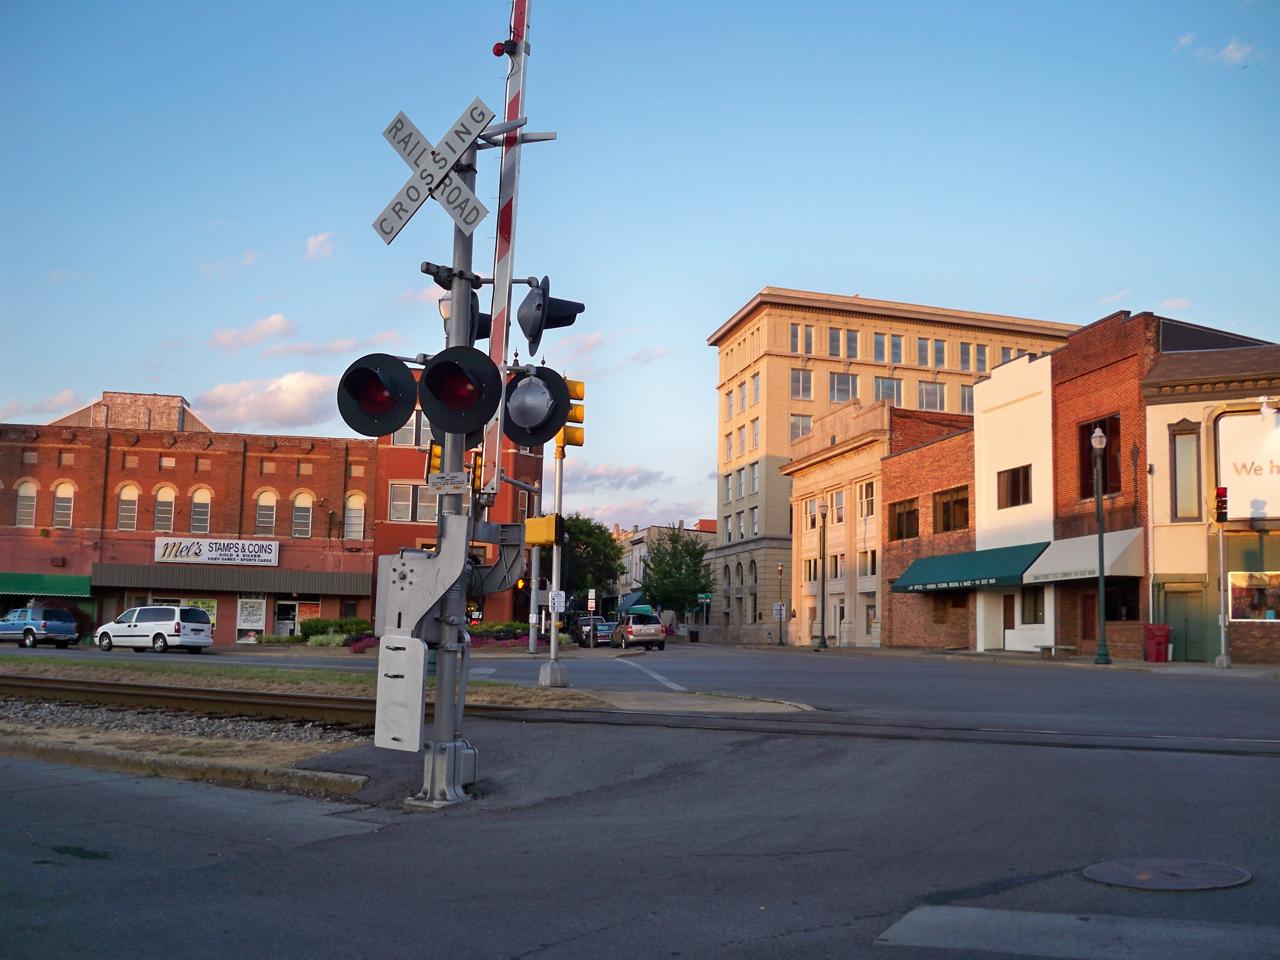 Johnsoncitydowntown